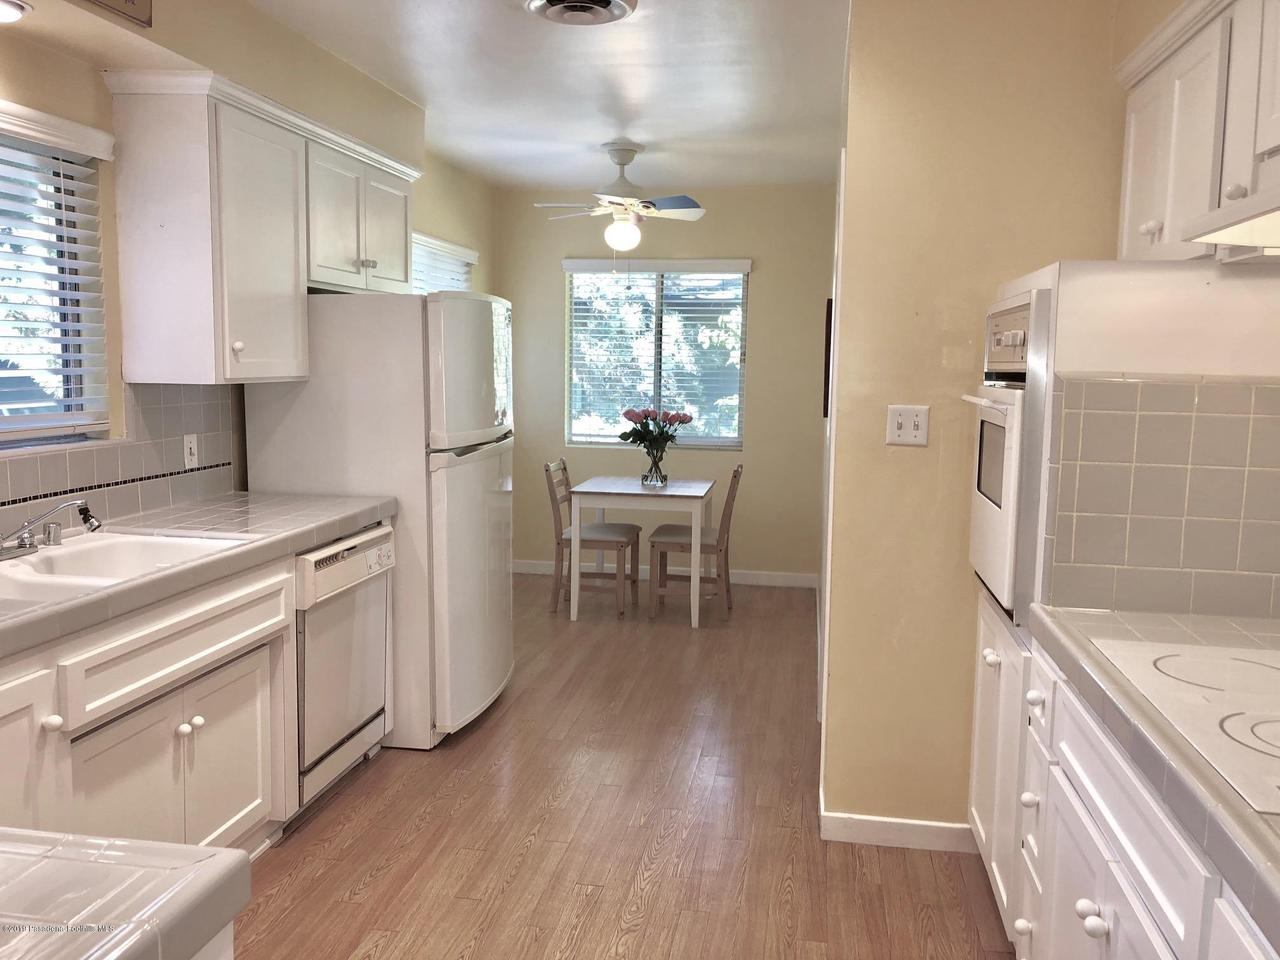 1205 ORANGE GROVE, Pasadena, CA 91105 - IMG_0531